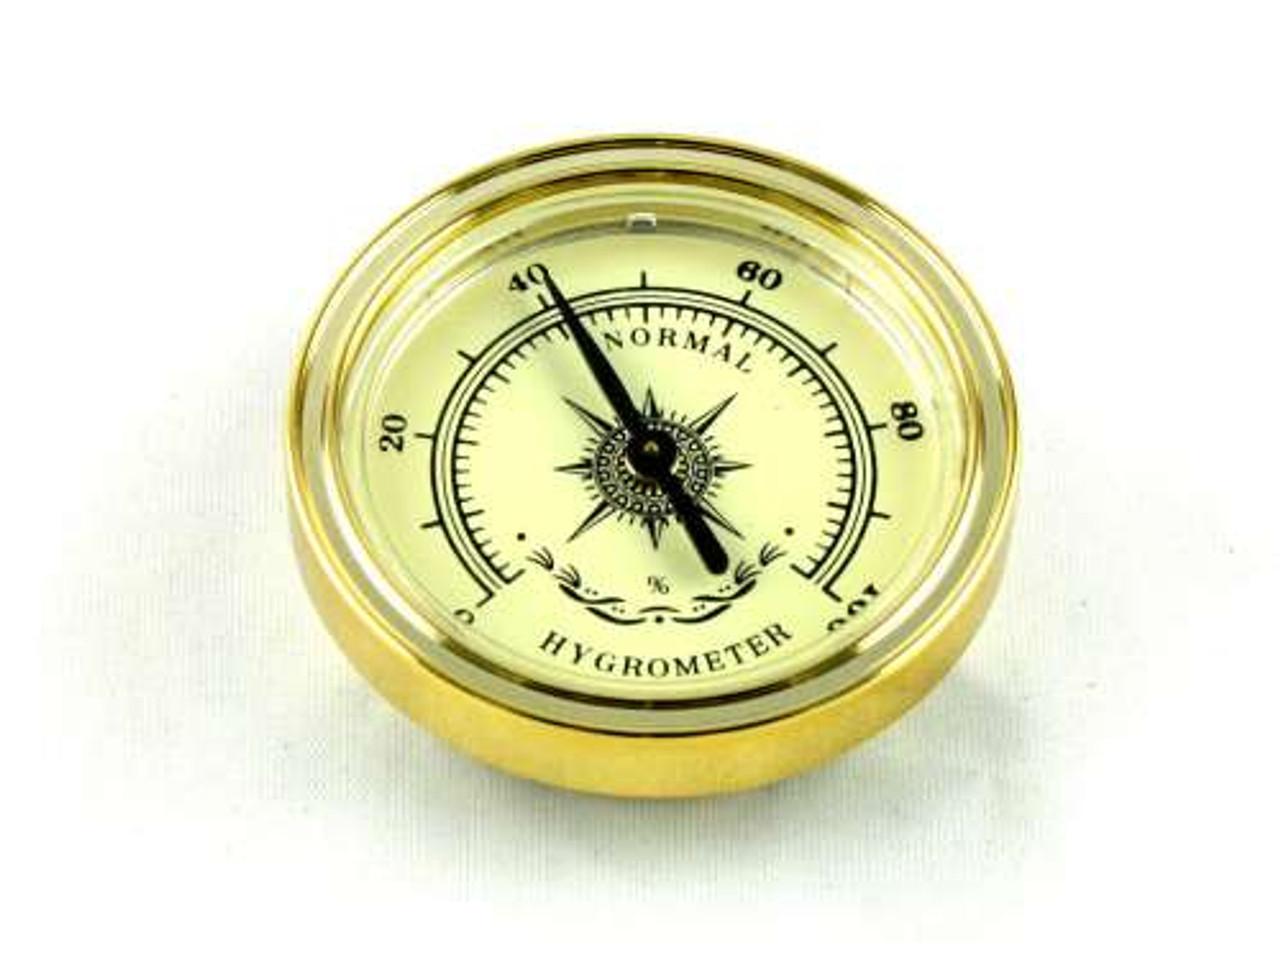 Bryce Gold Analog Cigar Hygrometer